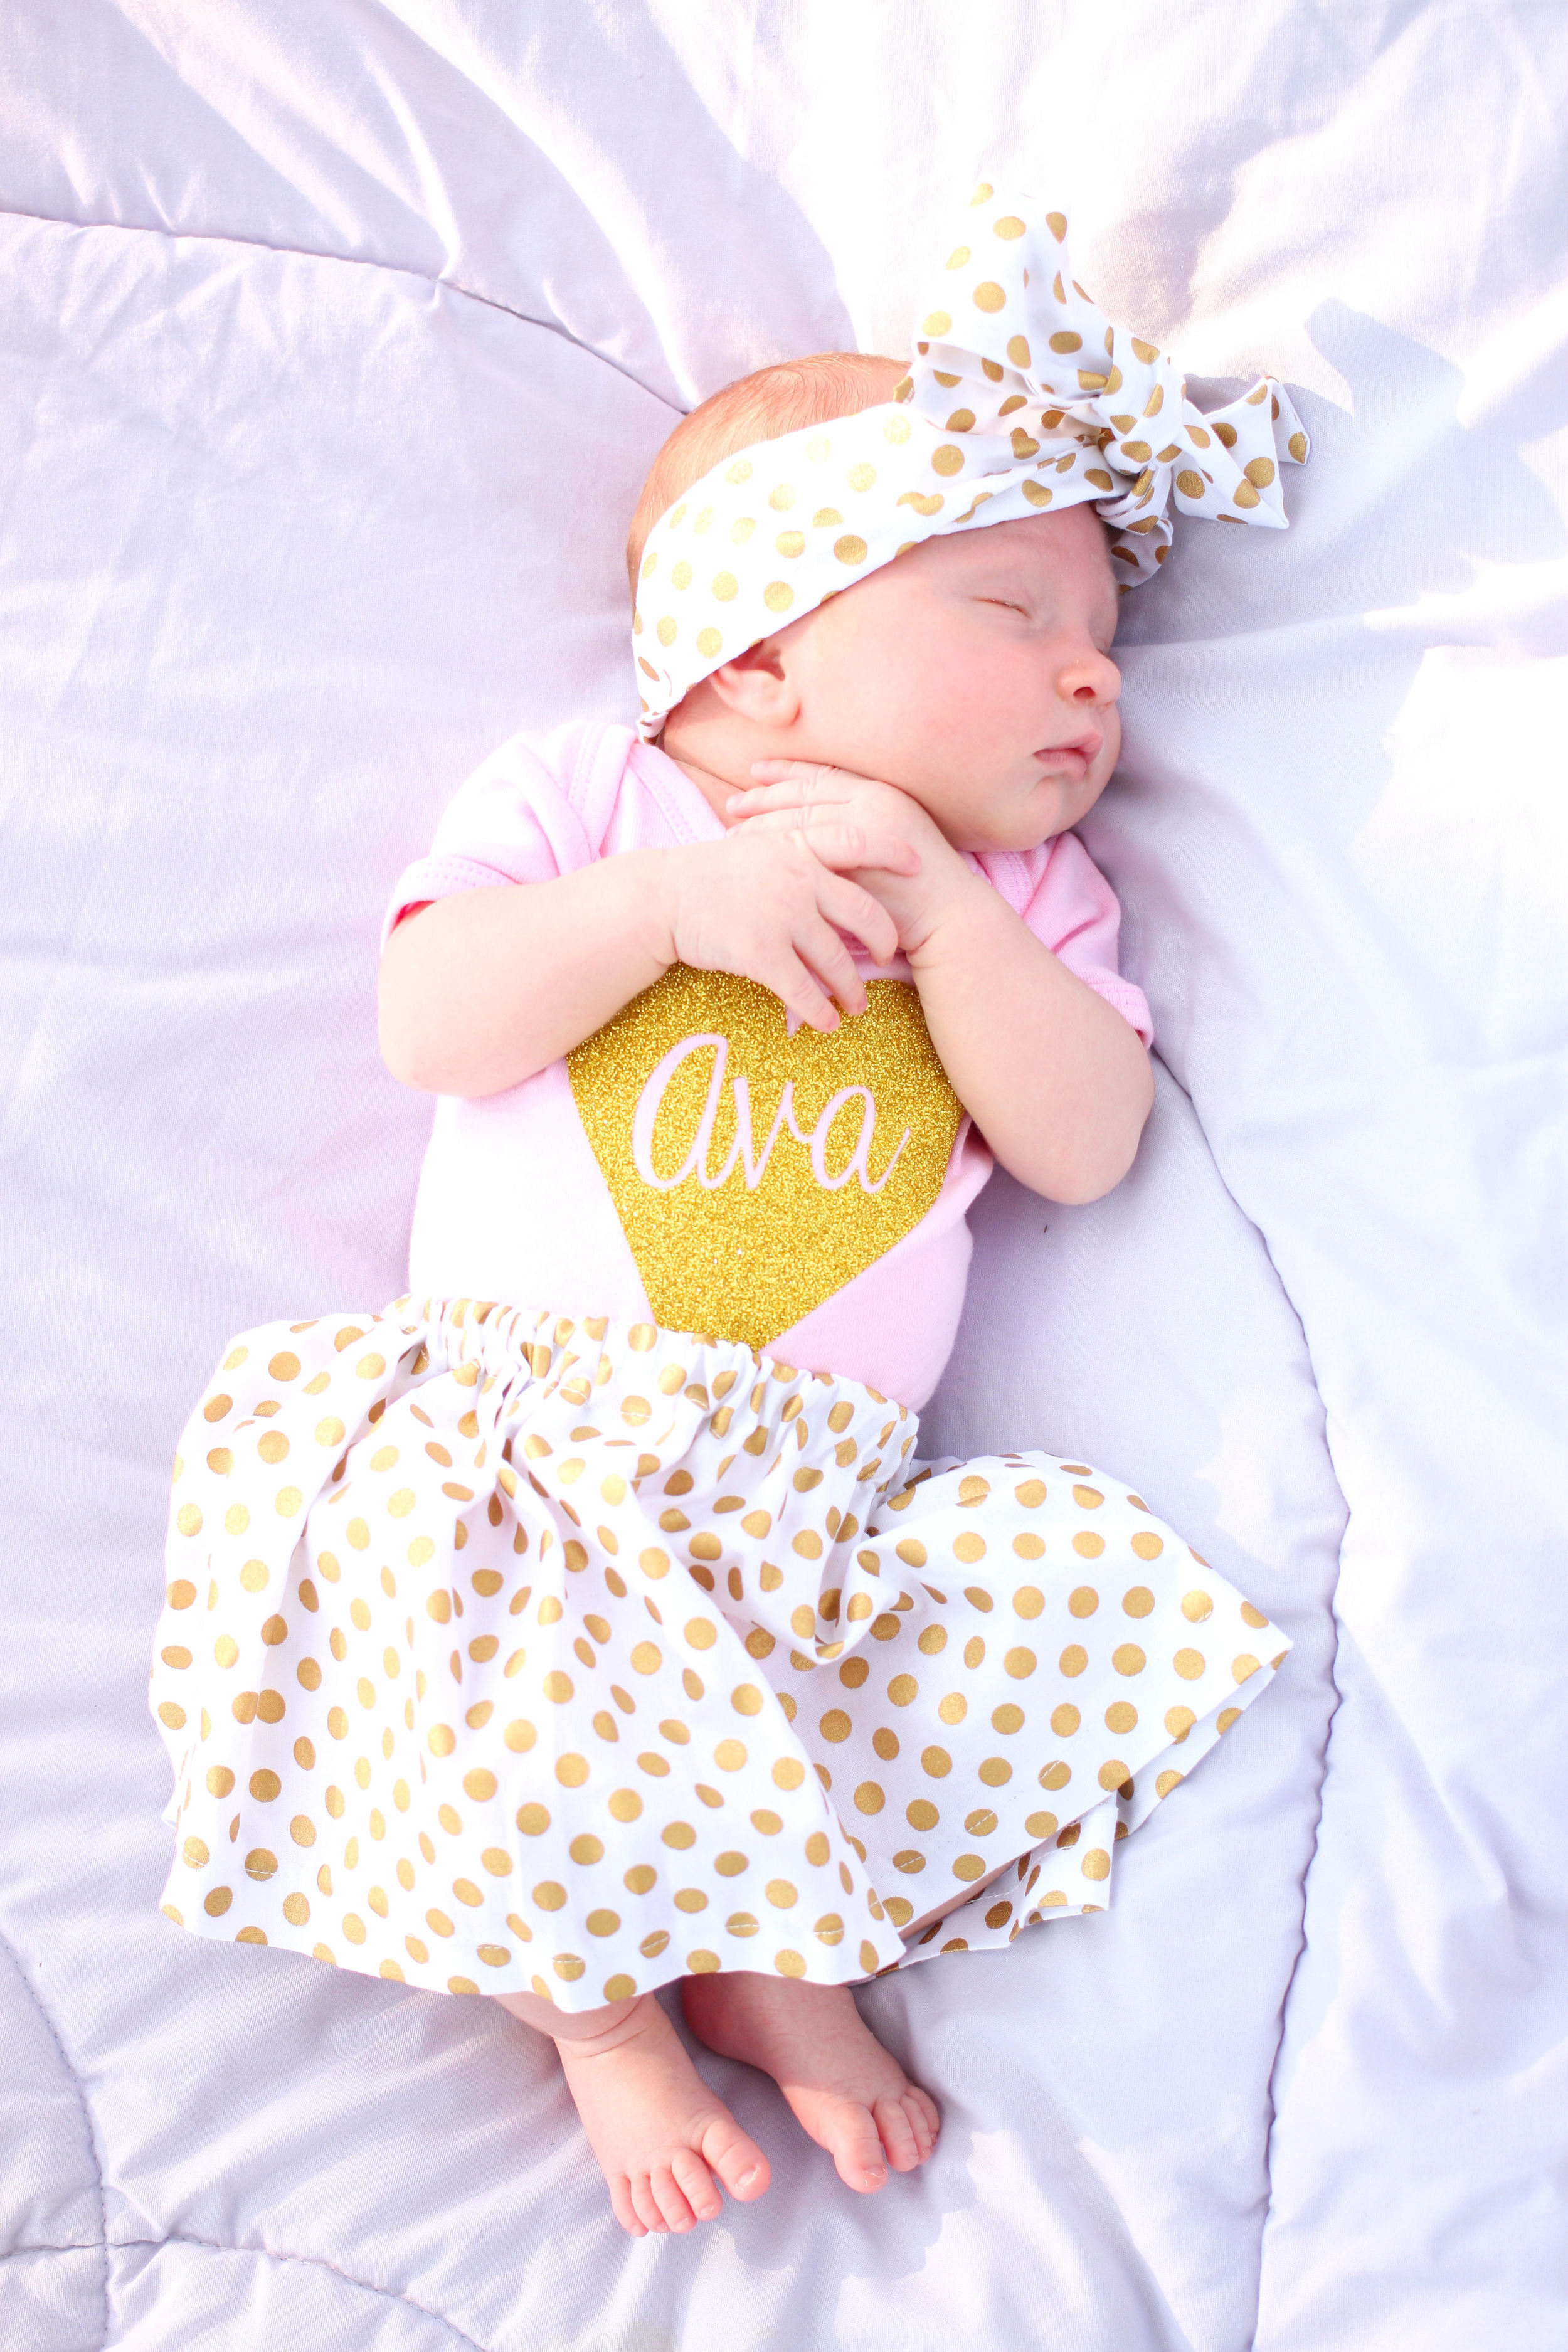 All That Glitters Baby- Enchanting Elegance